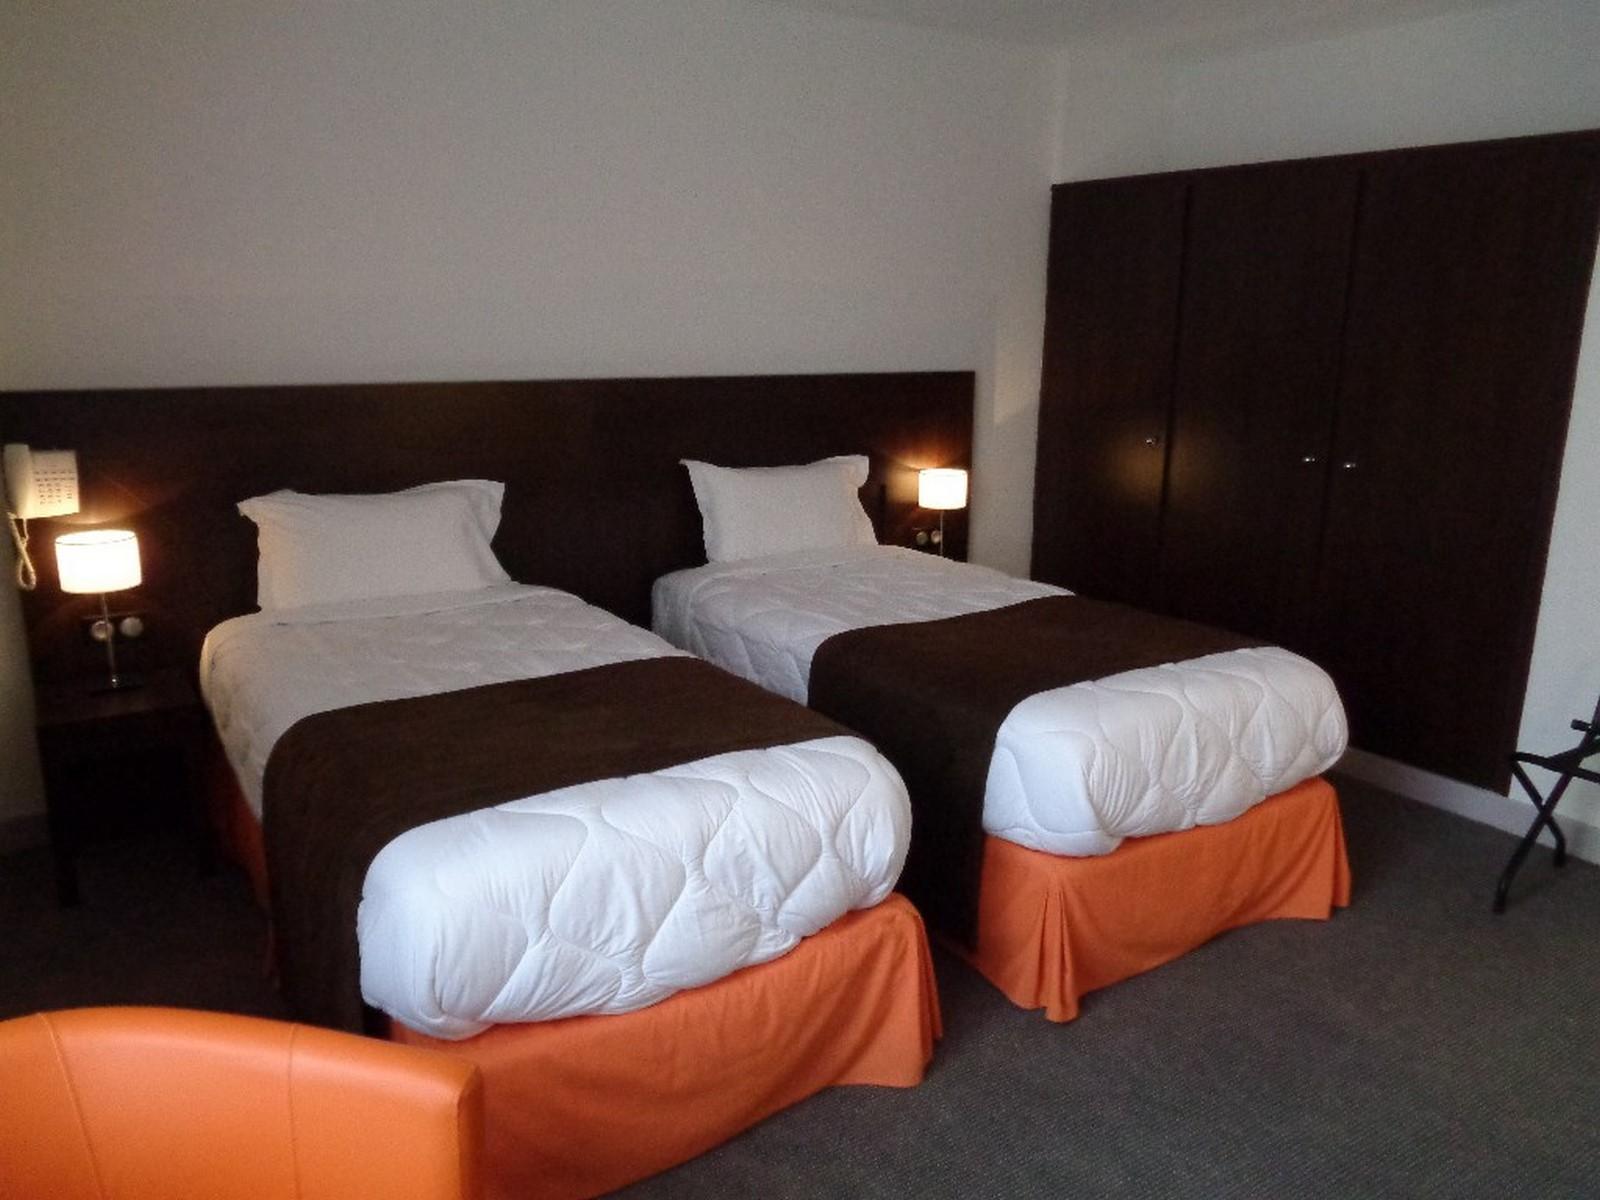 Hotel de Montaulbain  Verdun  1h de Paris Strasbourg en TGV